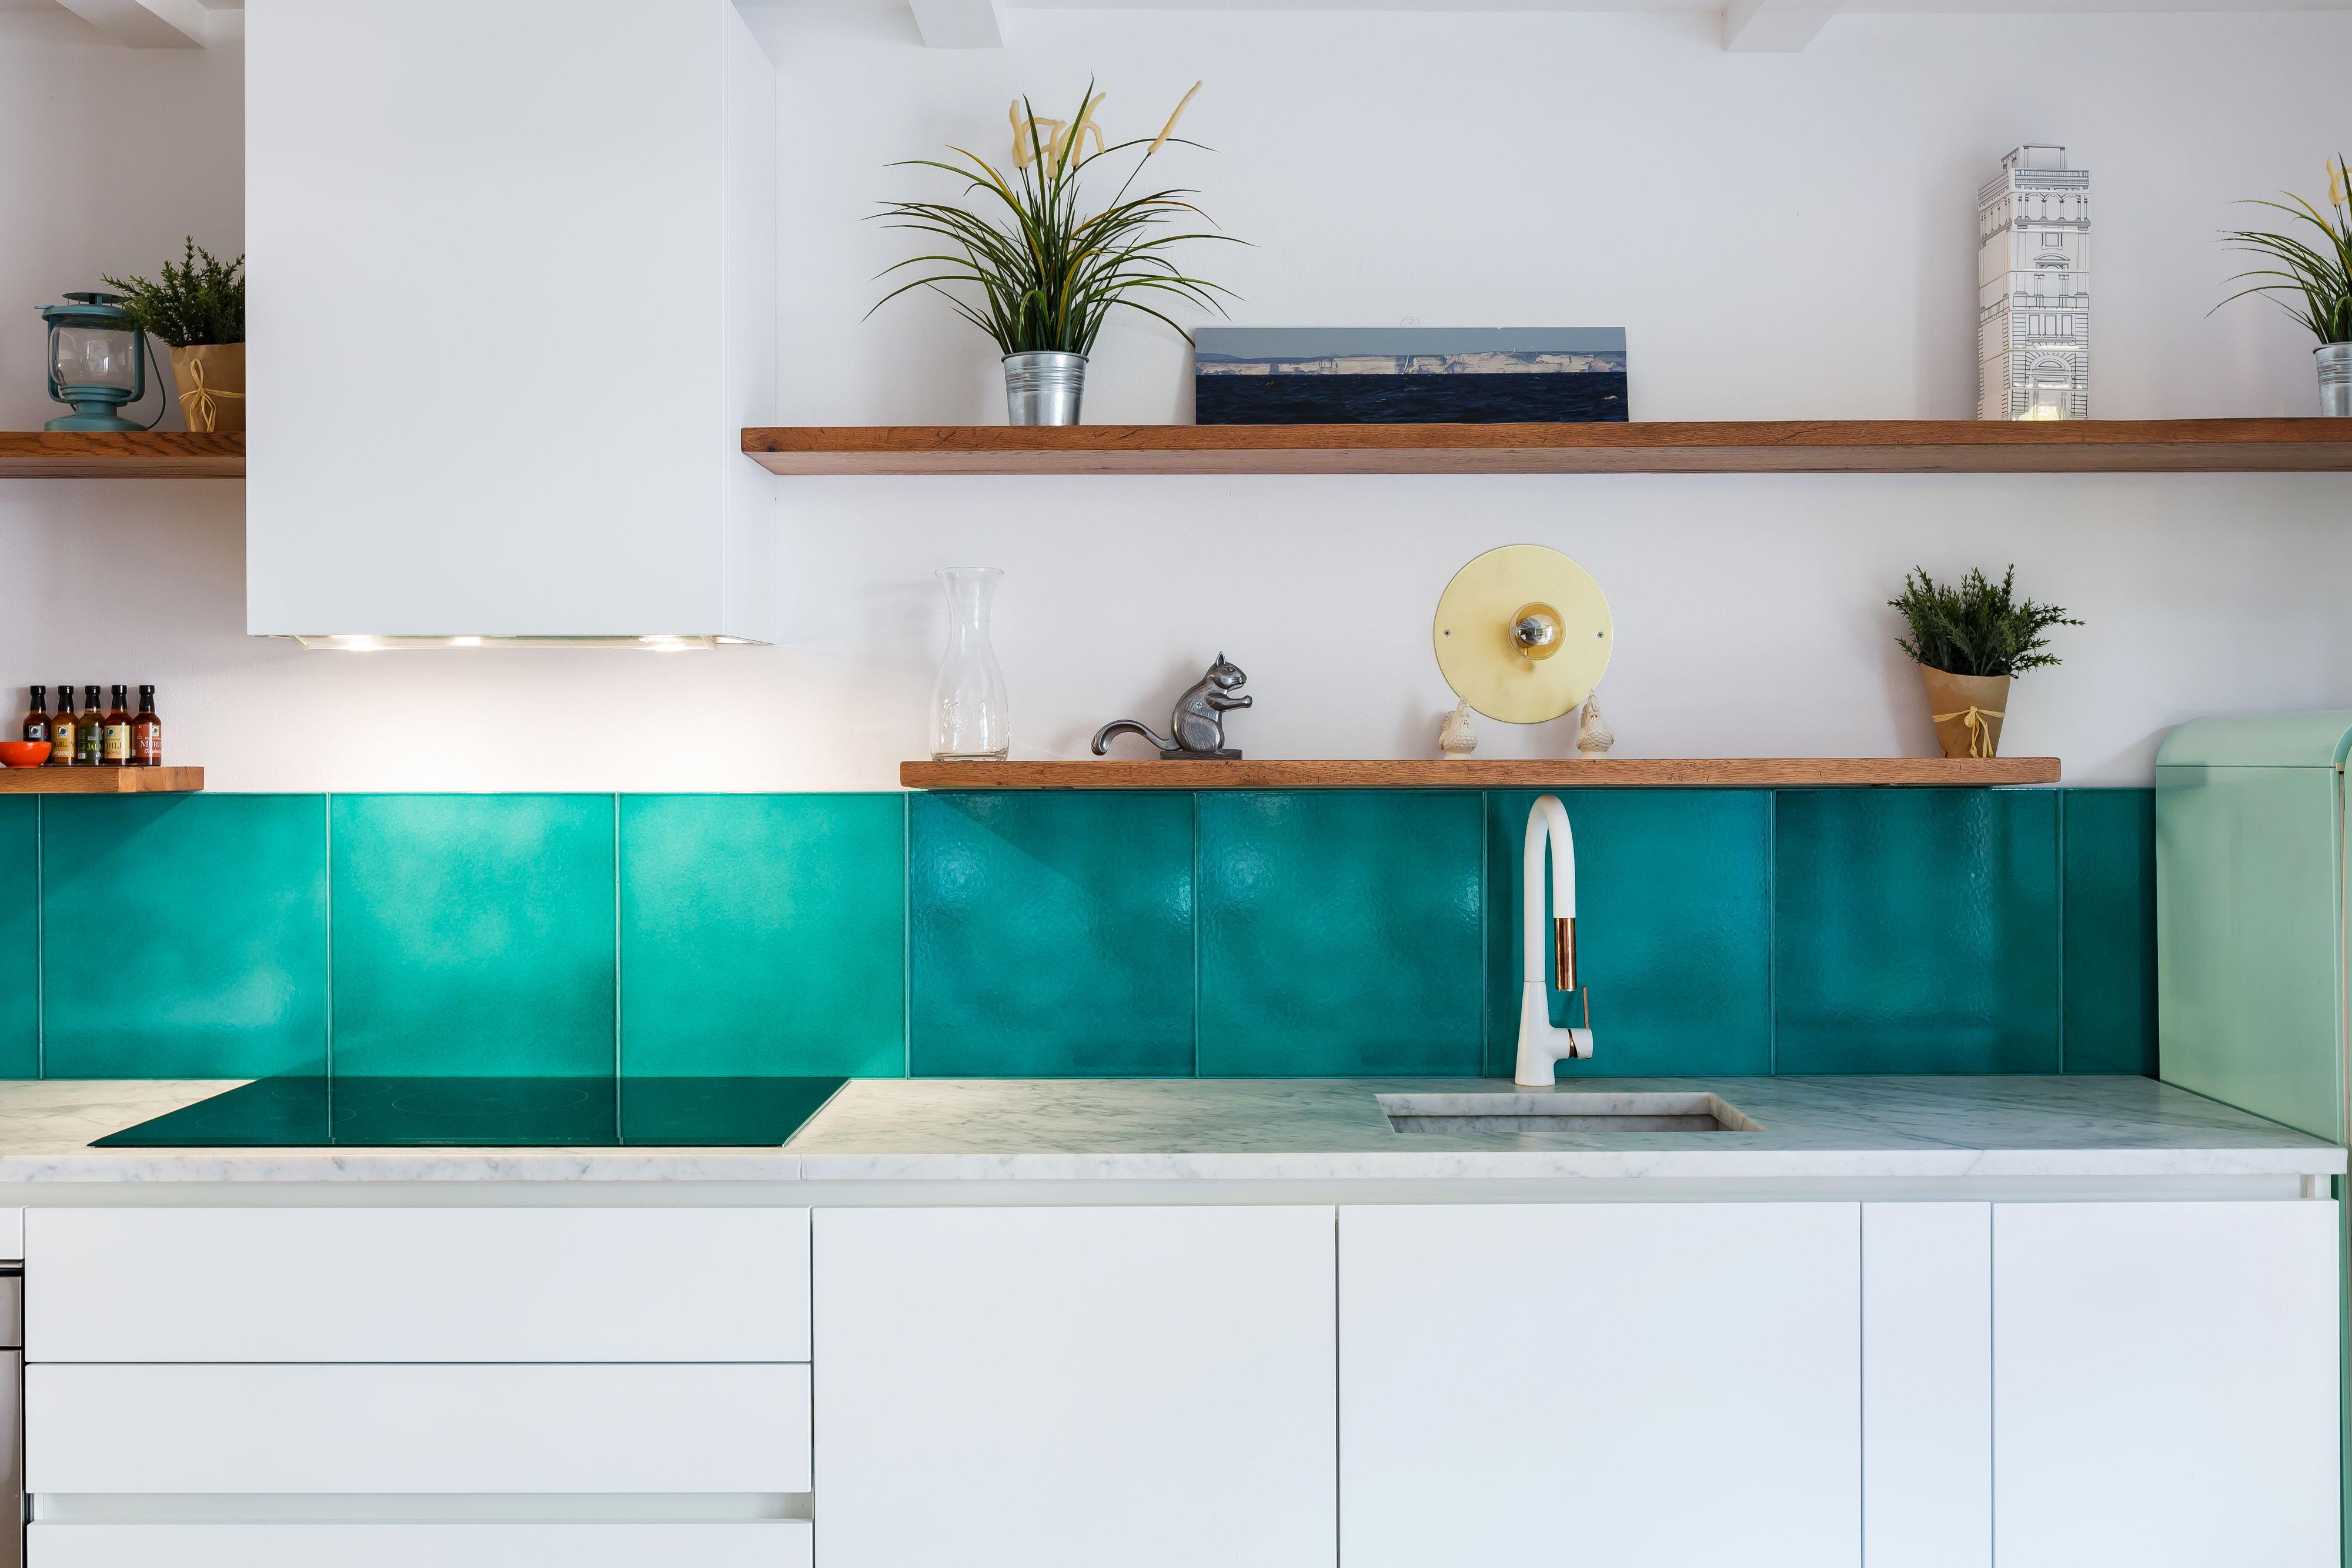 madeamano Work - Casa M - Kitchen: Backsplash tiles: Cristalli C/2 ...